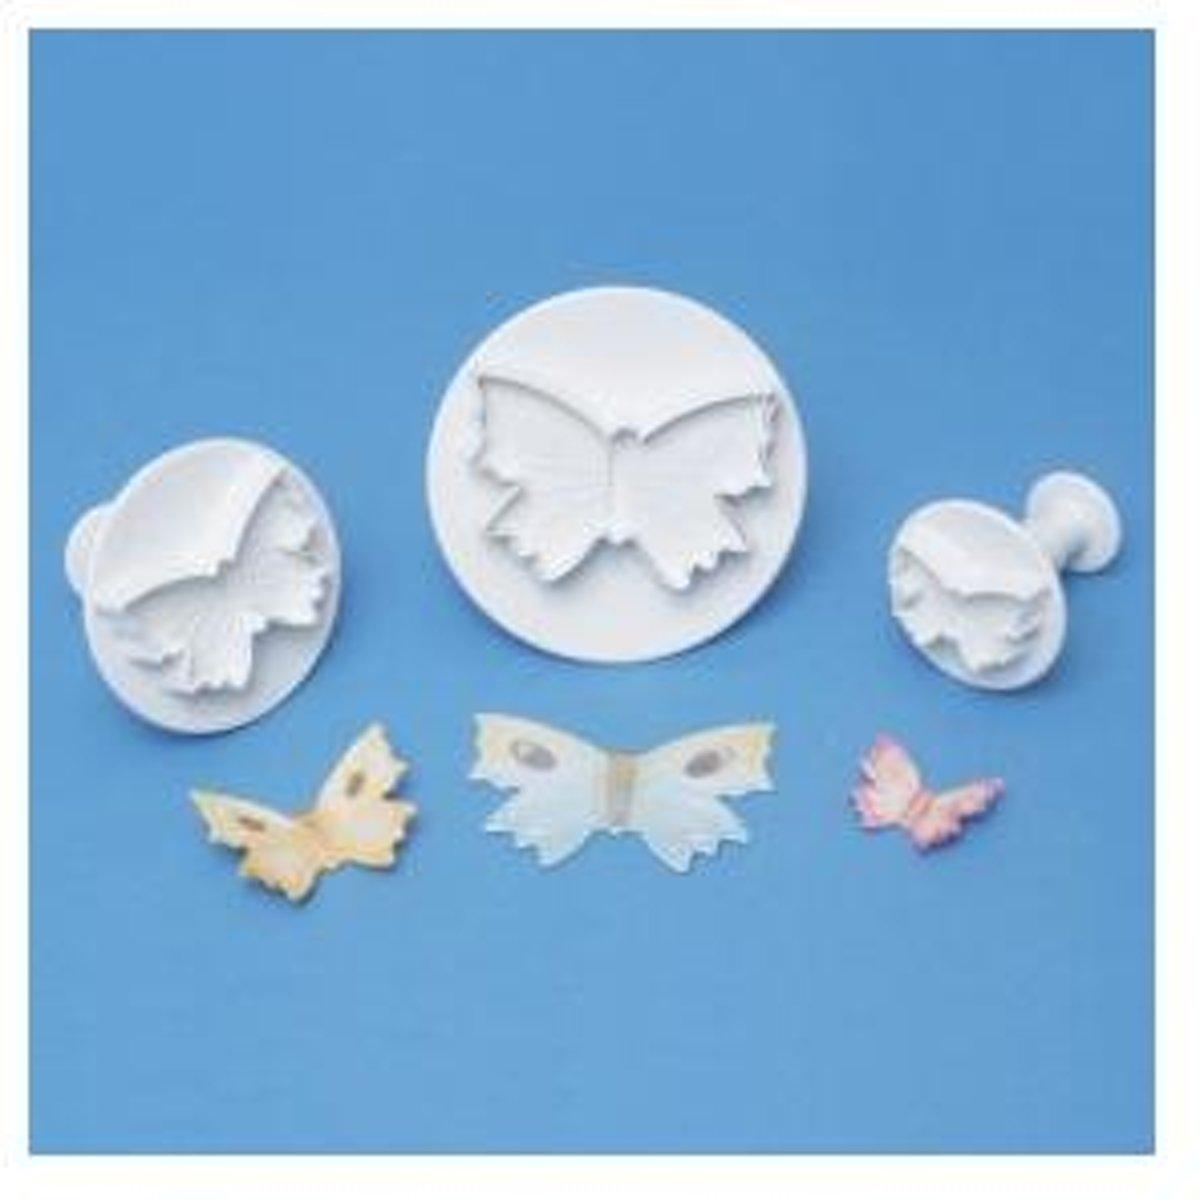 Plunger cutter - vlinder - small - PME Arts&Crafts kopen